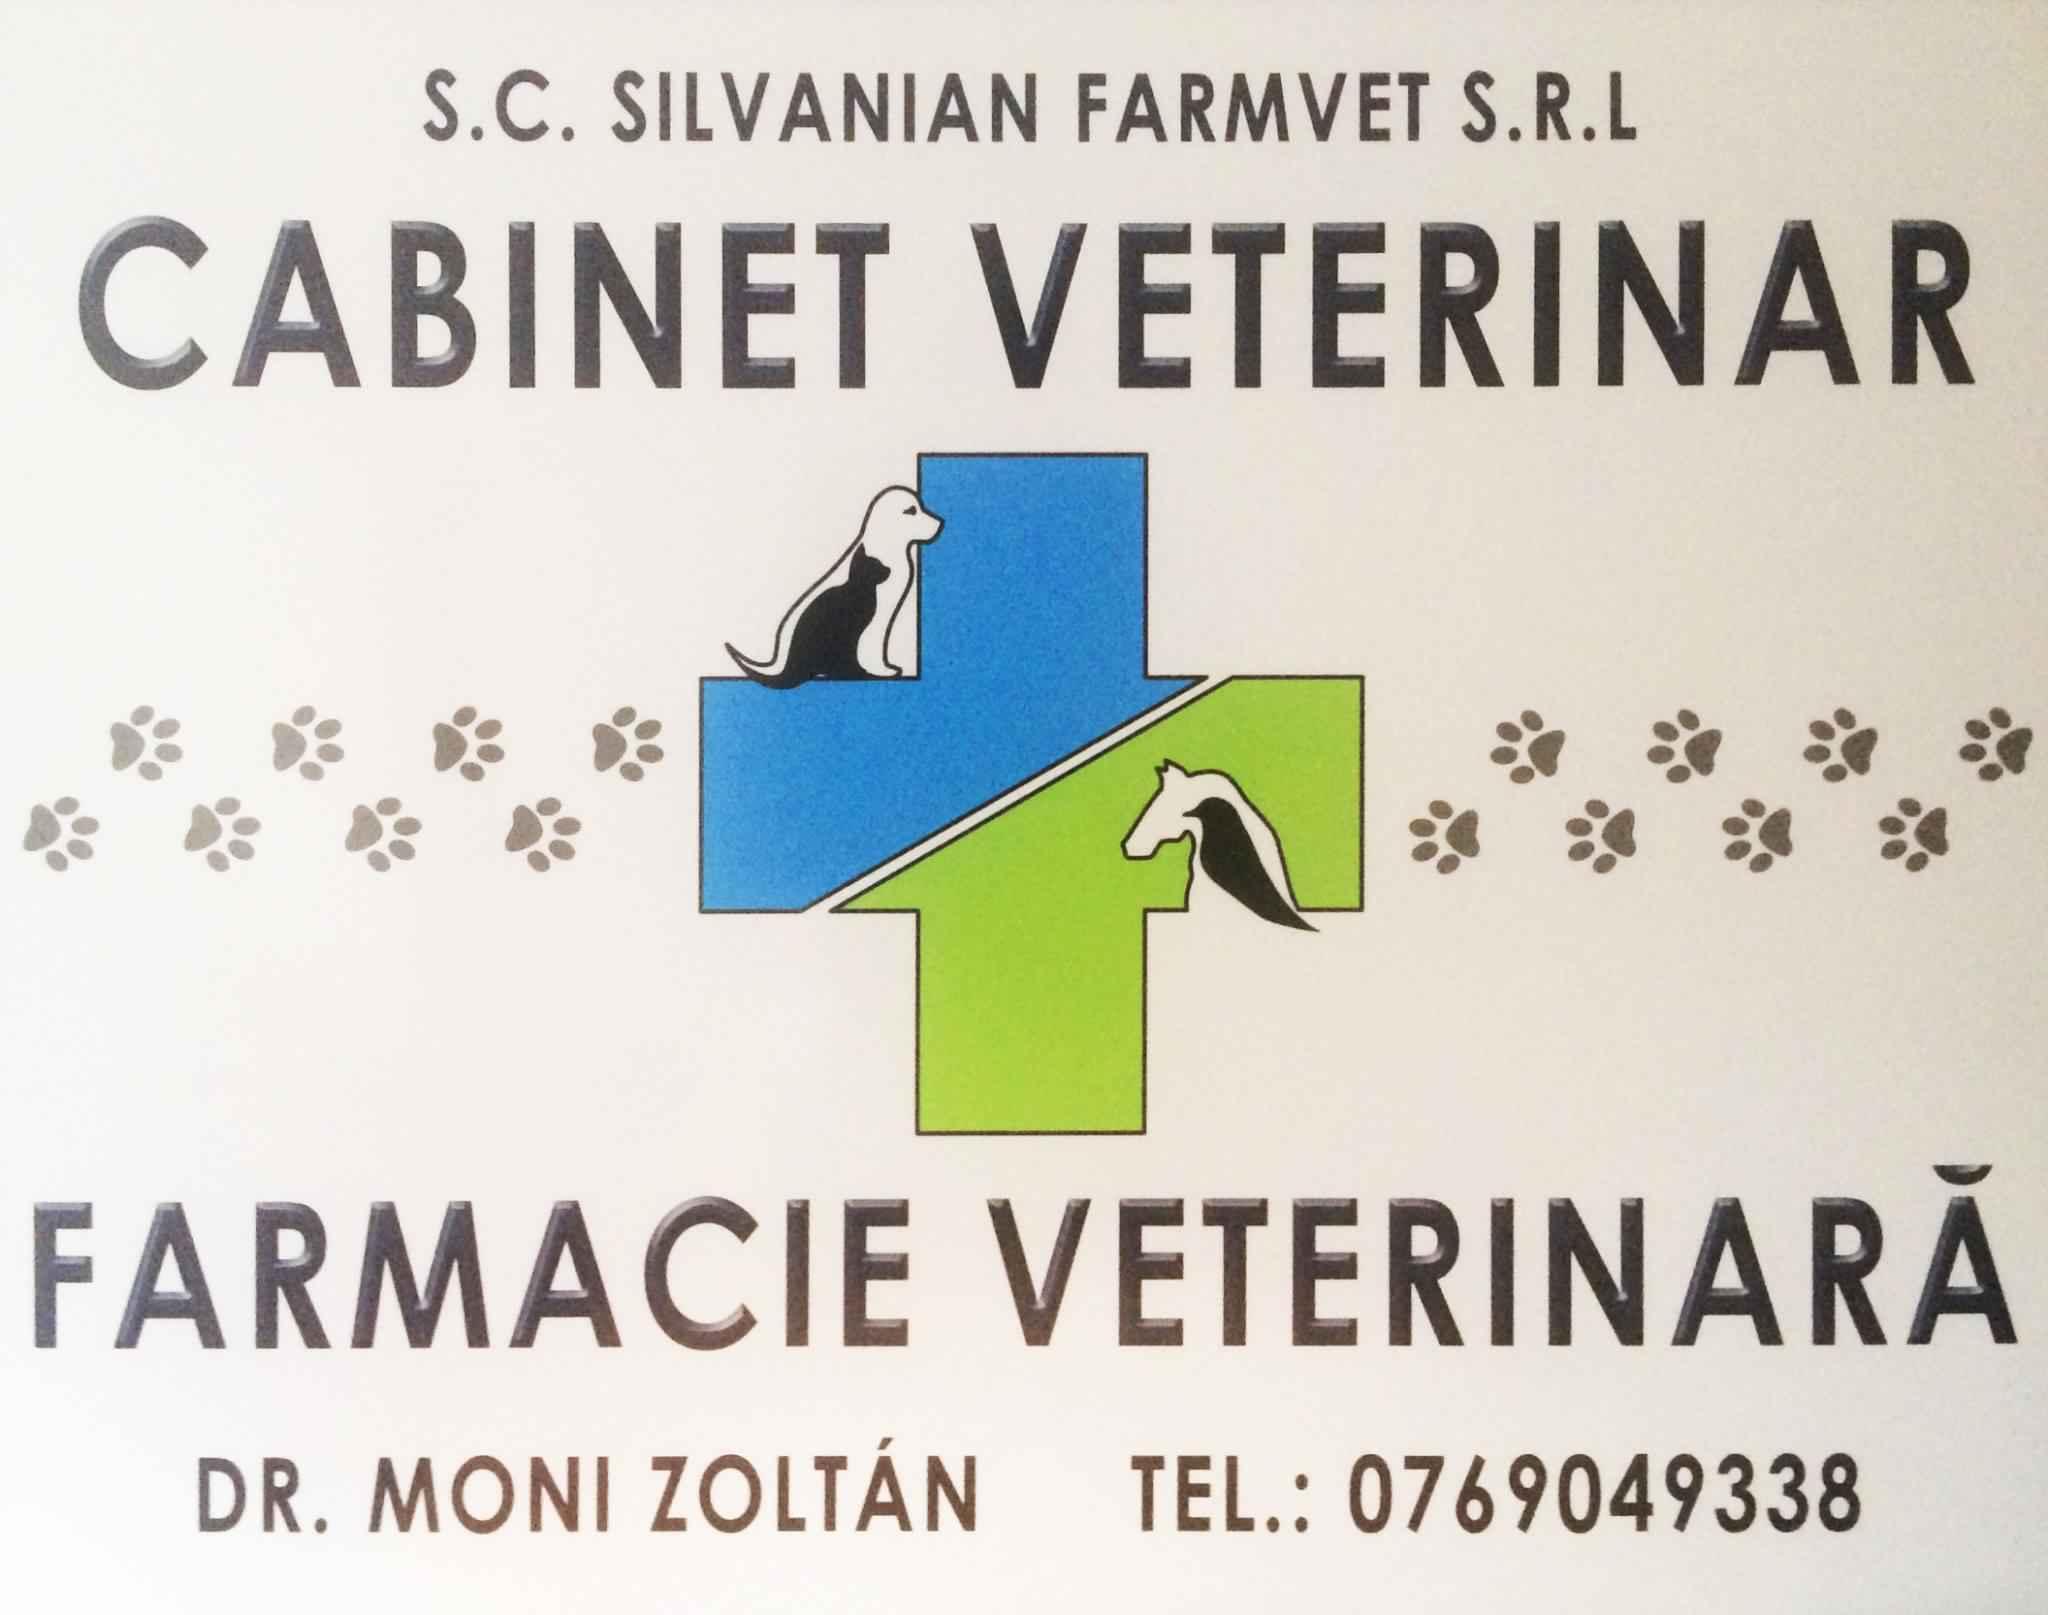 Farmacie Veterinara & Cabinet Veterinar Silvanian Farmvet